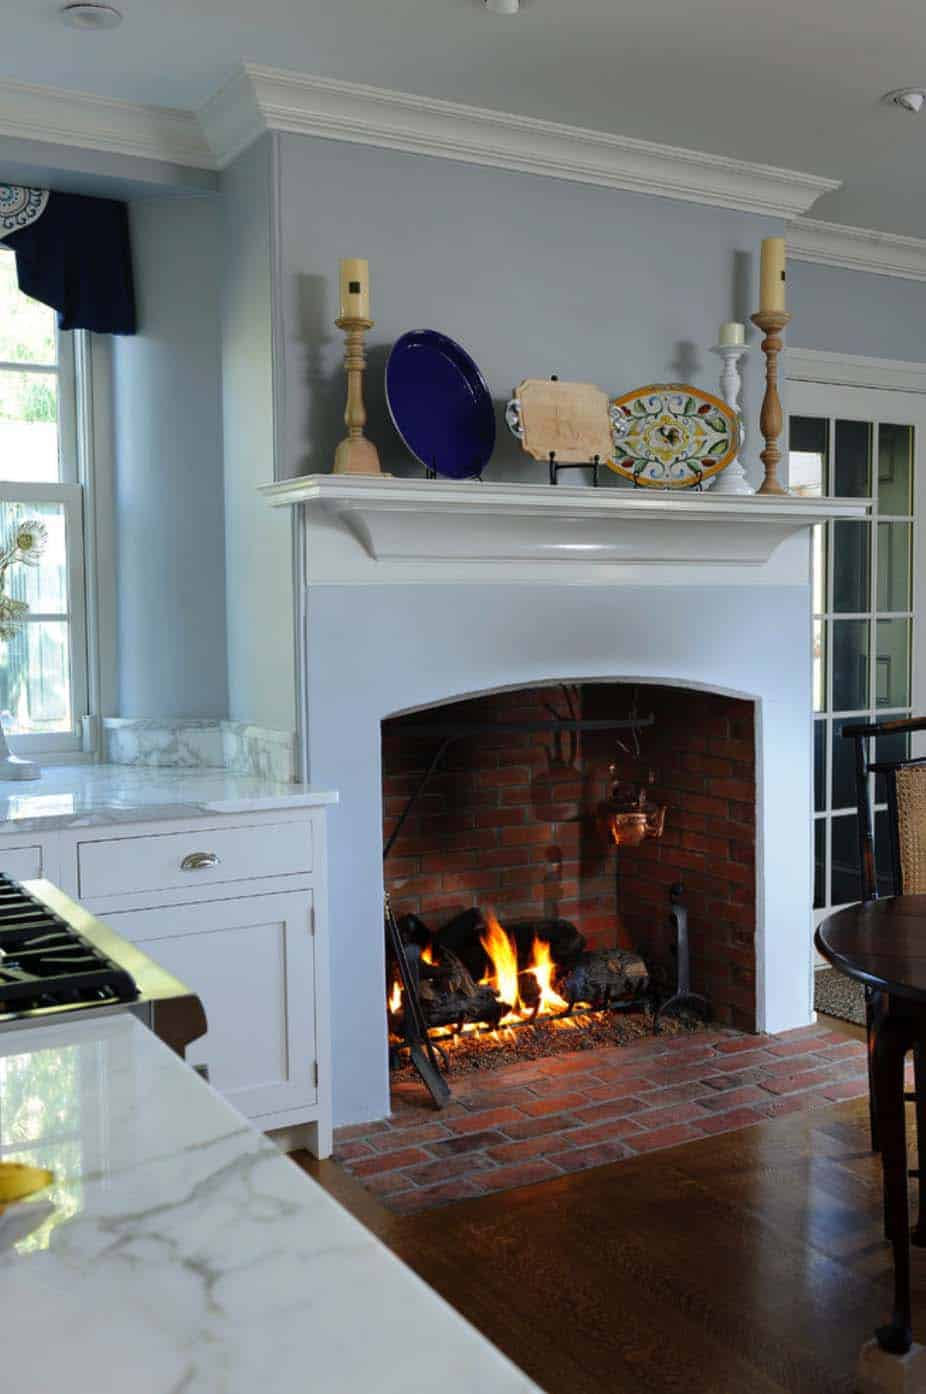 Kitchen Showcasing Cozy Fireplace-08-1 Kindesign